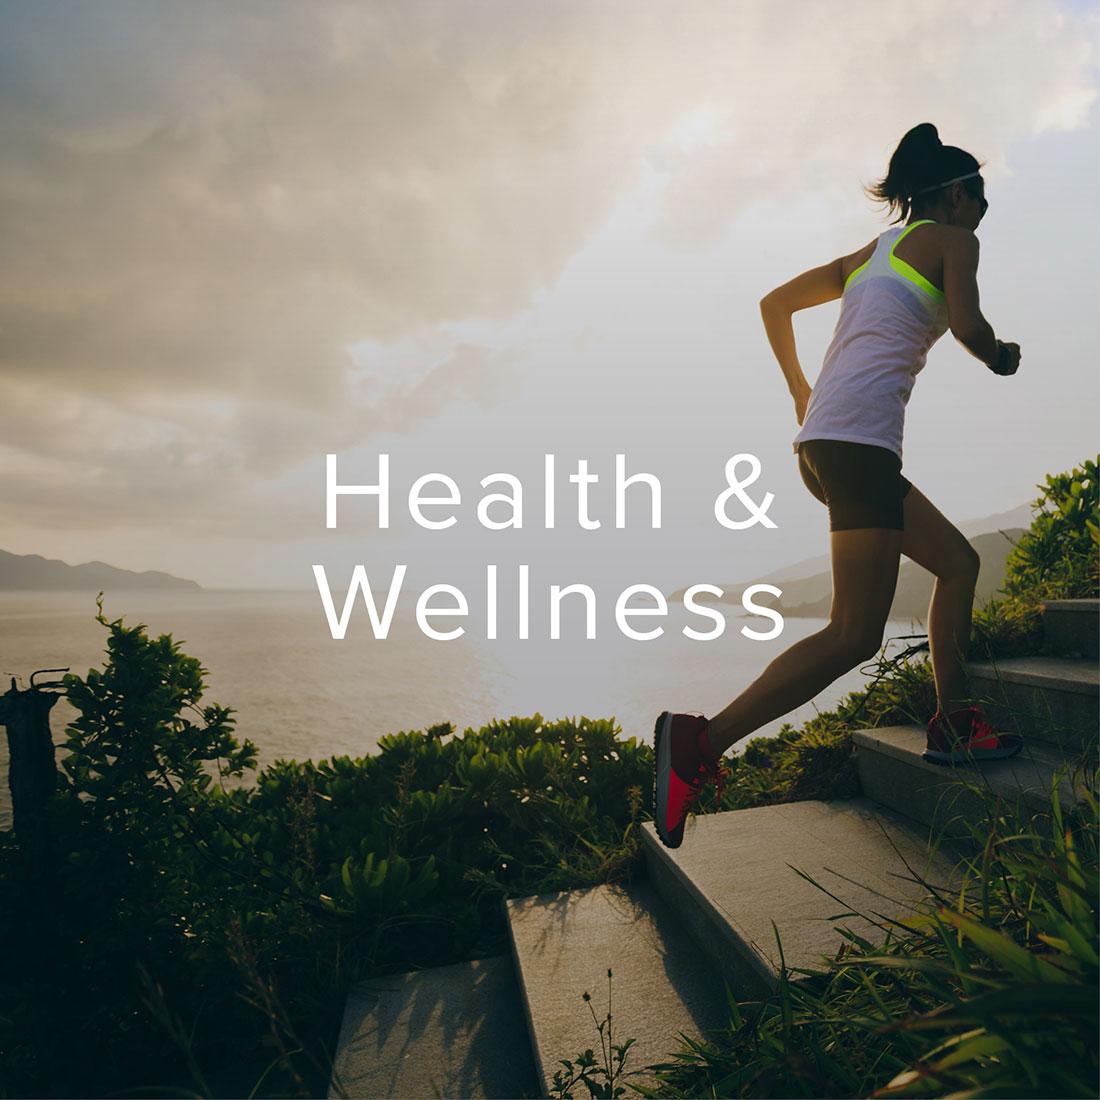 holos_life_sciences_epigenetics_health_wellness.jpg